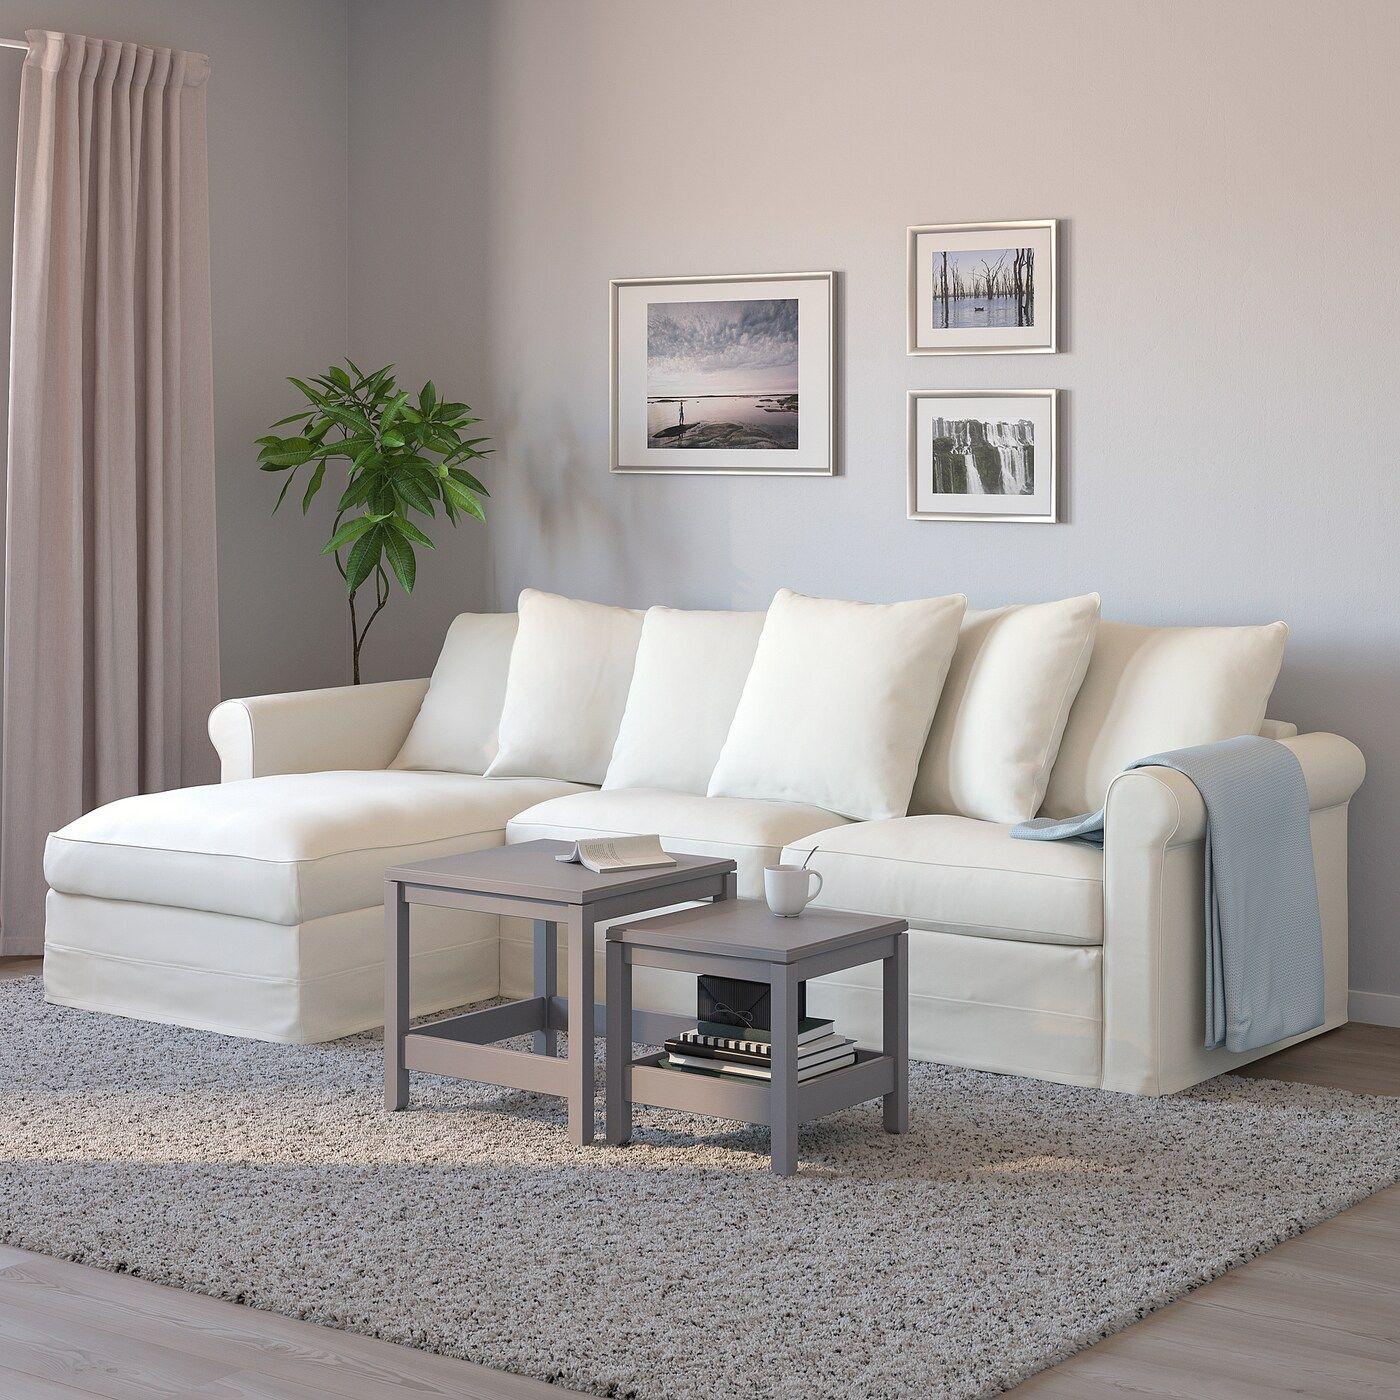 Vindum Rug High Pile White 6 7 X8 10 In 2020 Bettsofa Recamiere Sitzgruppe